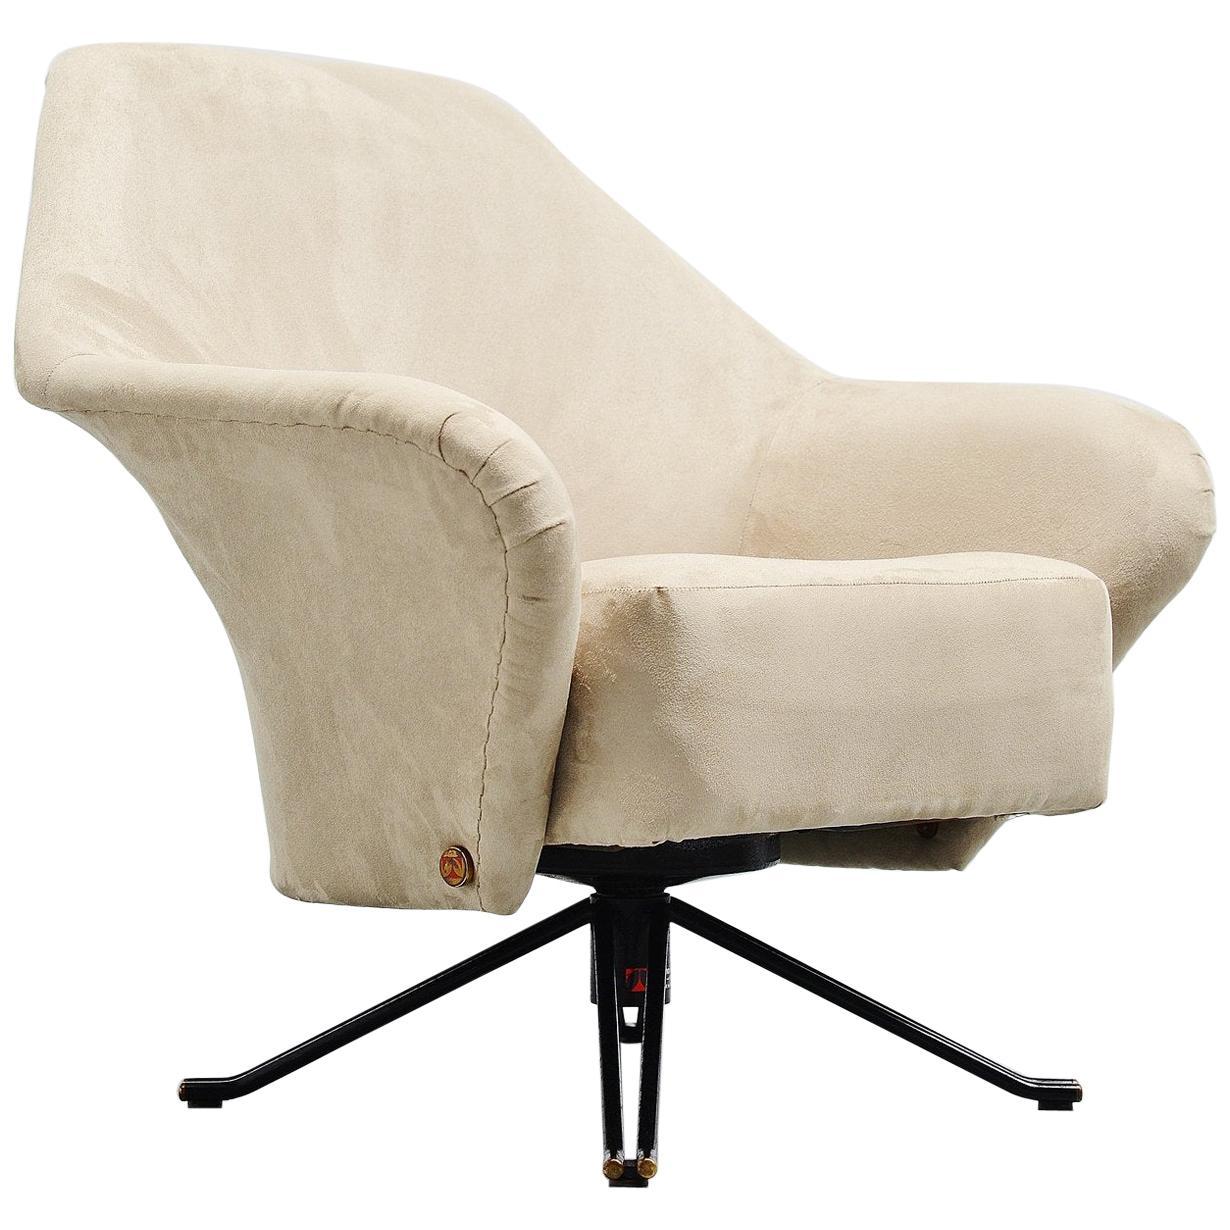 Osvaldo Borsani P32 Lounge Chair Tecno, Italy, 1956